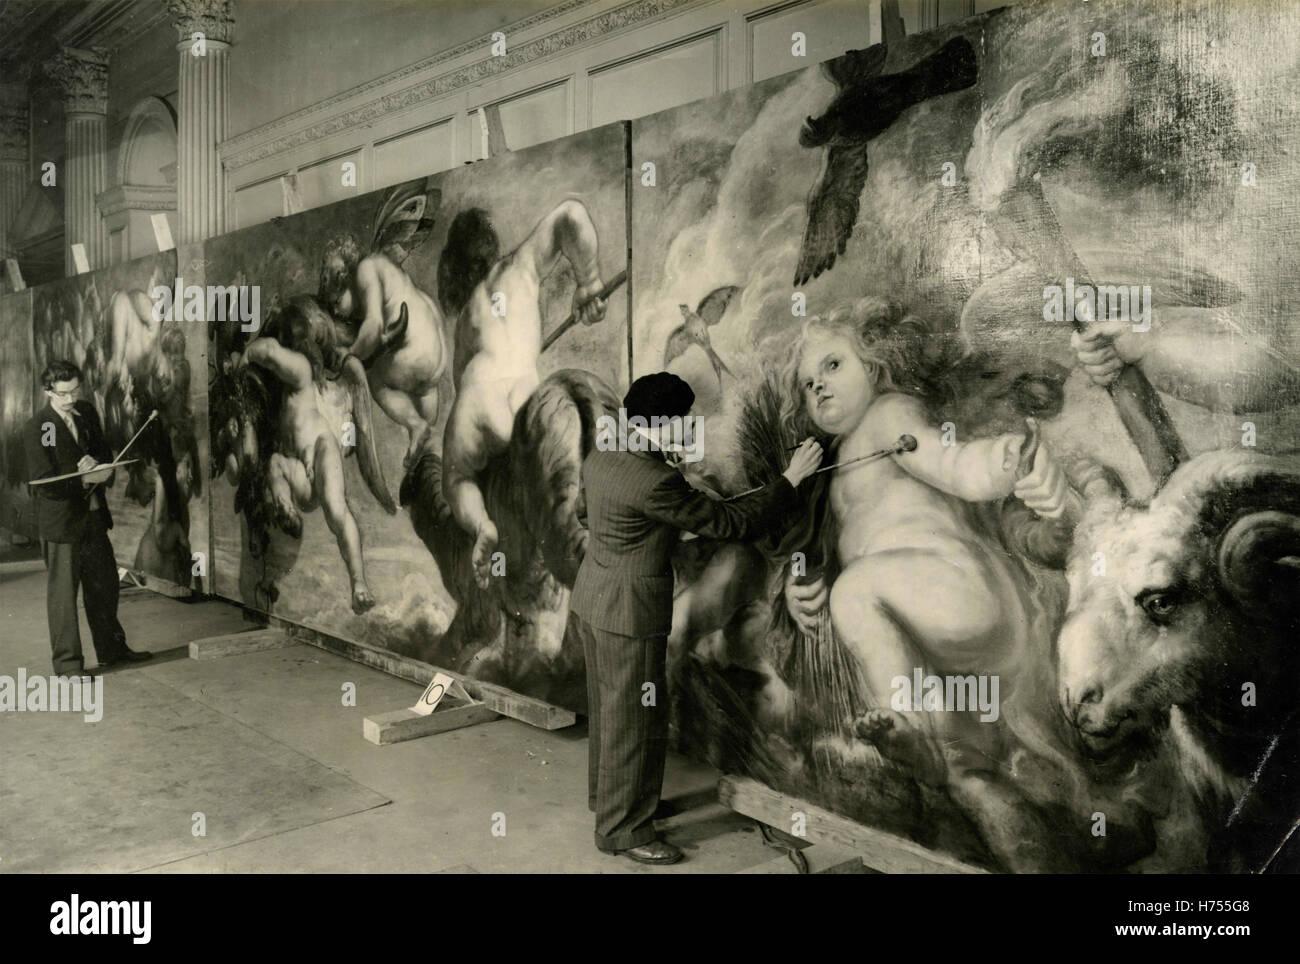 Restauración de paneles pintados por Peter Paul Rubens en el Palacio de Kensington, Londres, Reino Unido. Imagen De Stock